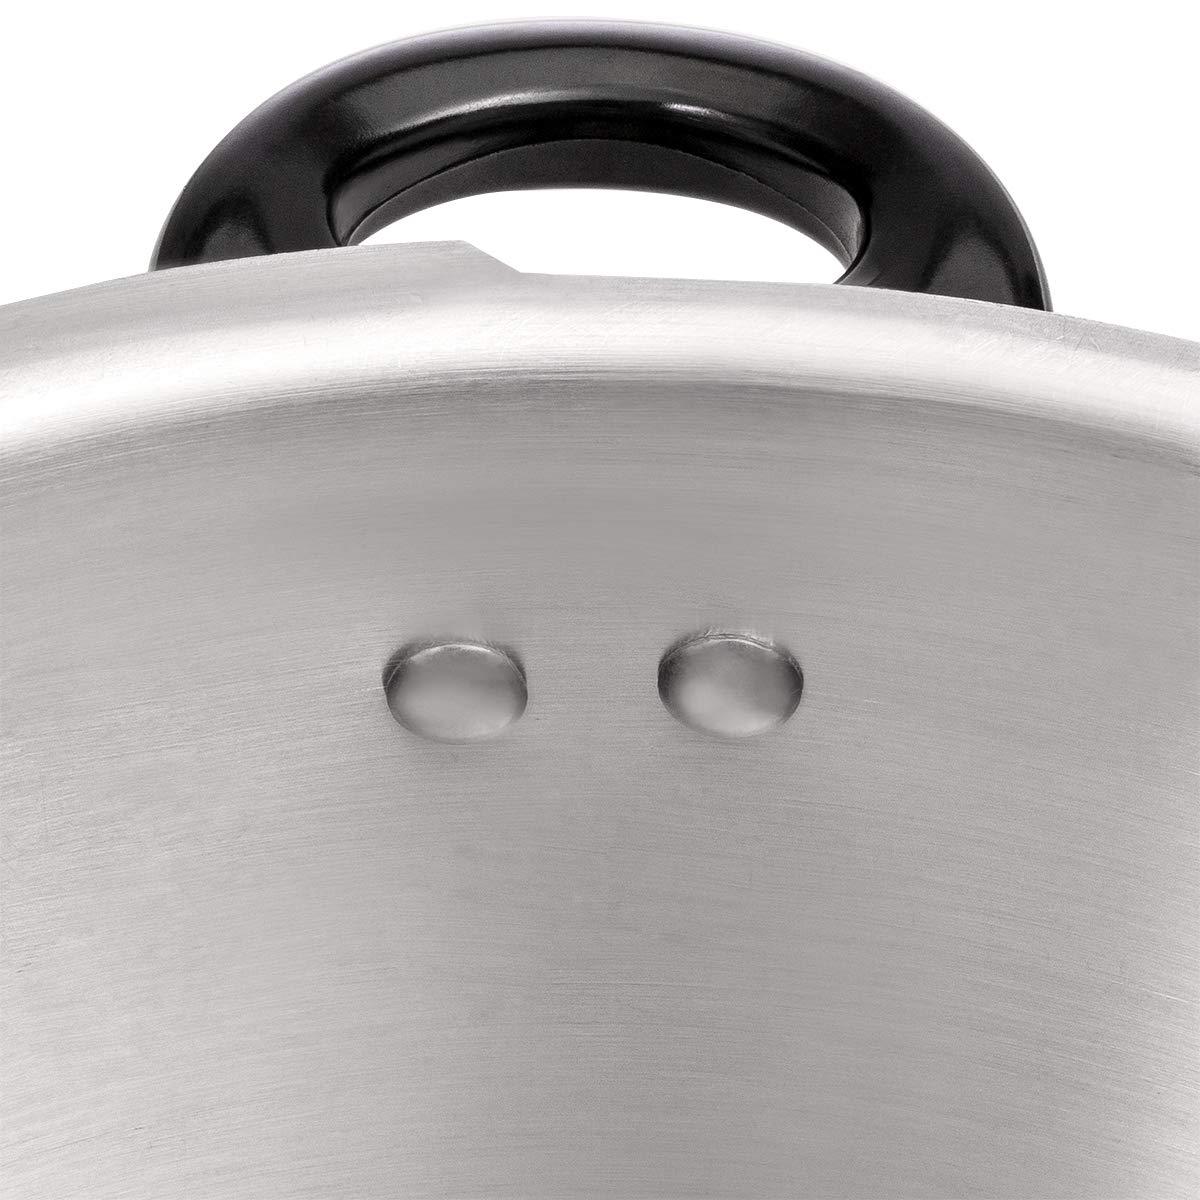 Barton 8-Quart Aluminum Pressure Cooker Stovetop Fast Cooker Pot Pressure Regulator Fast Cooking Steam Release Valve by Barton (Image #5)